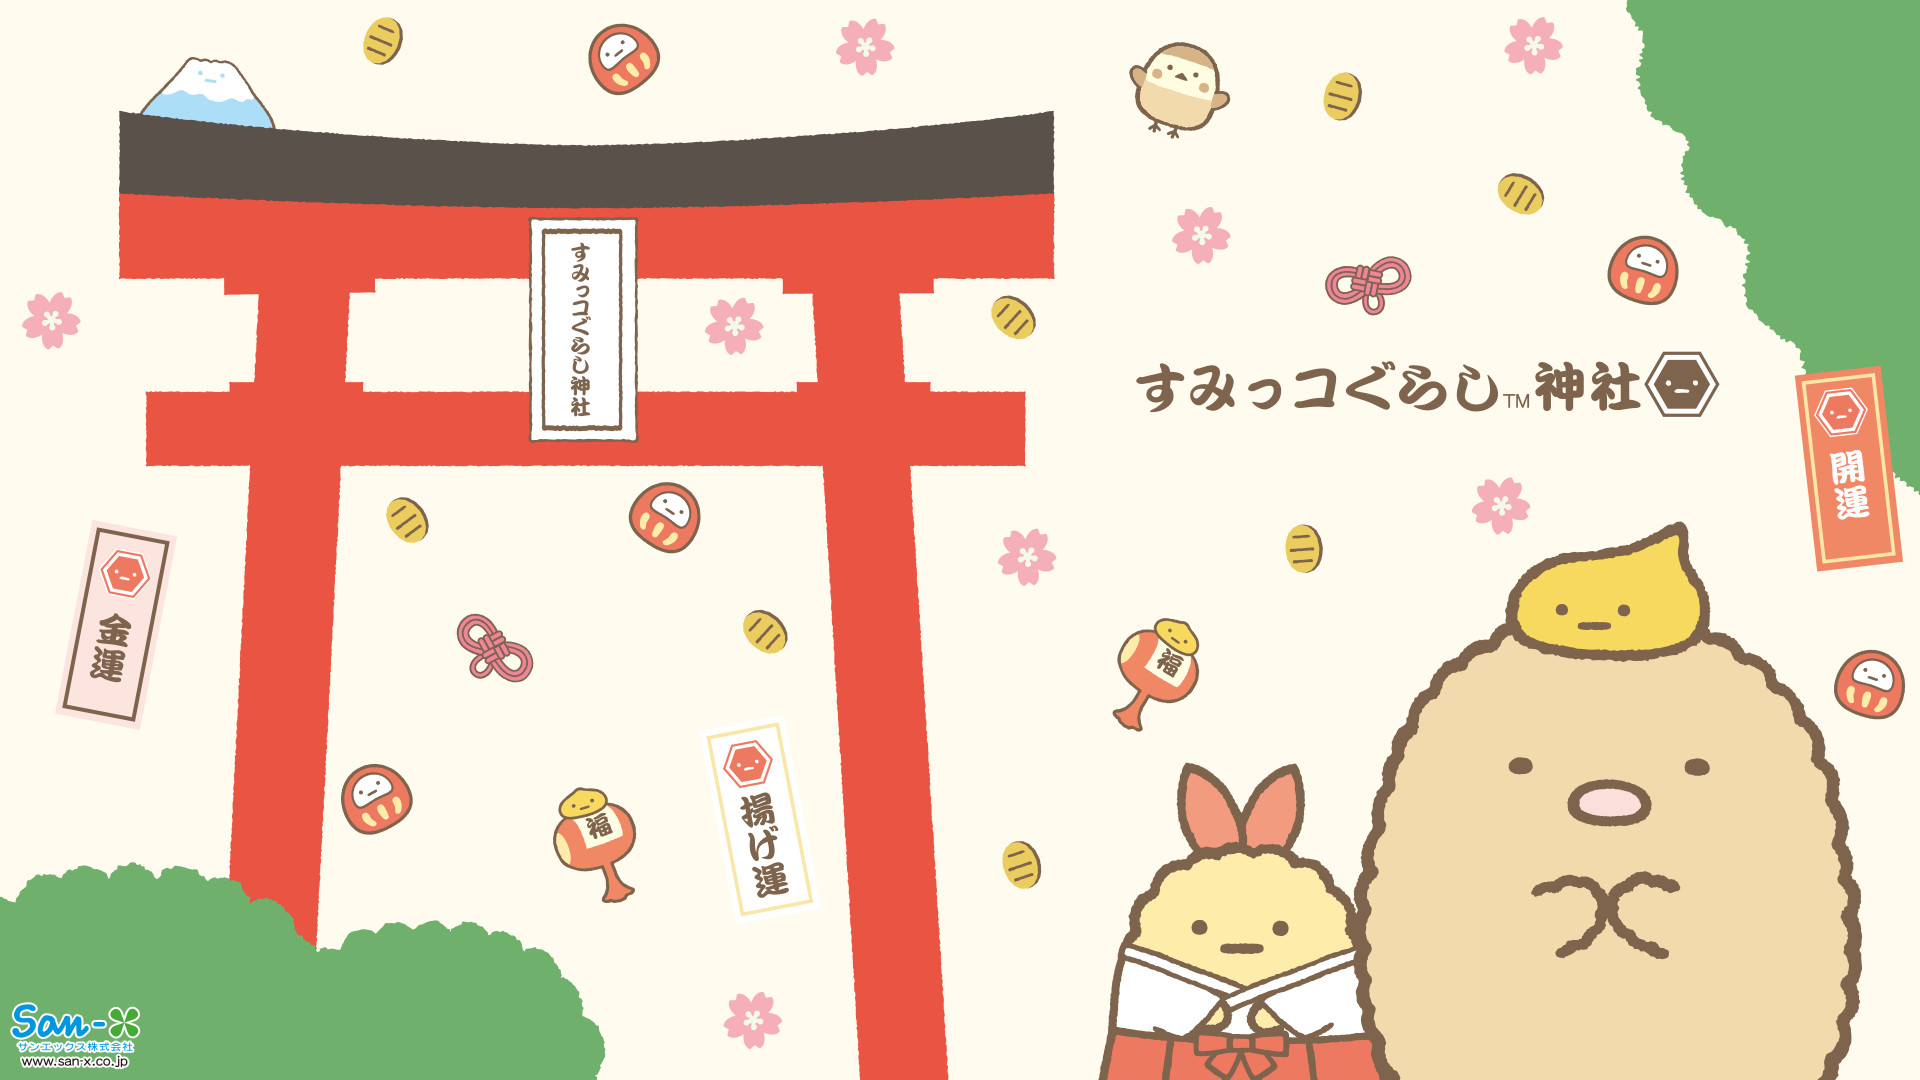 Panda Anime Wallpaper Kawaii Wallpapers 76 Images